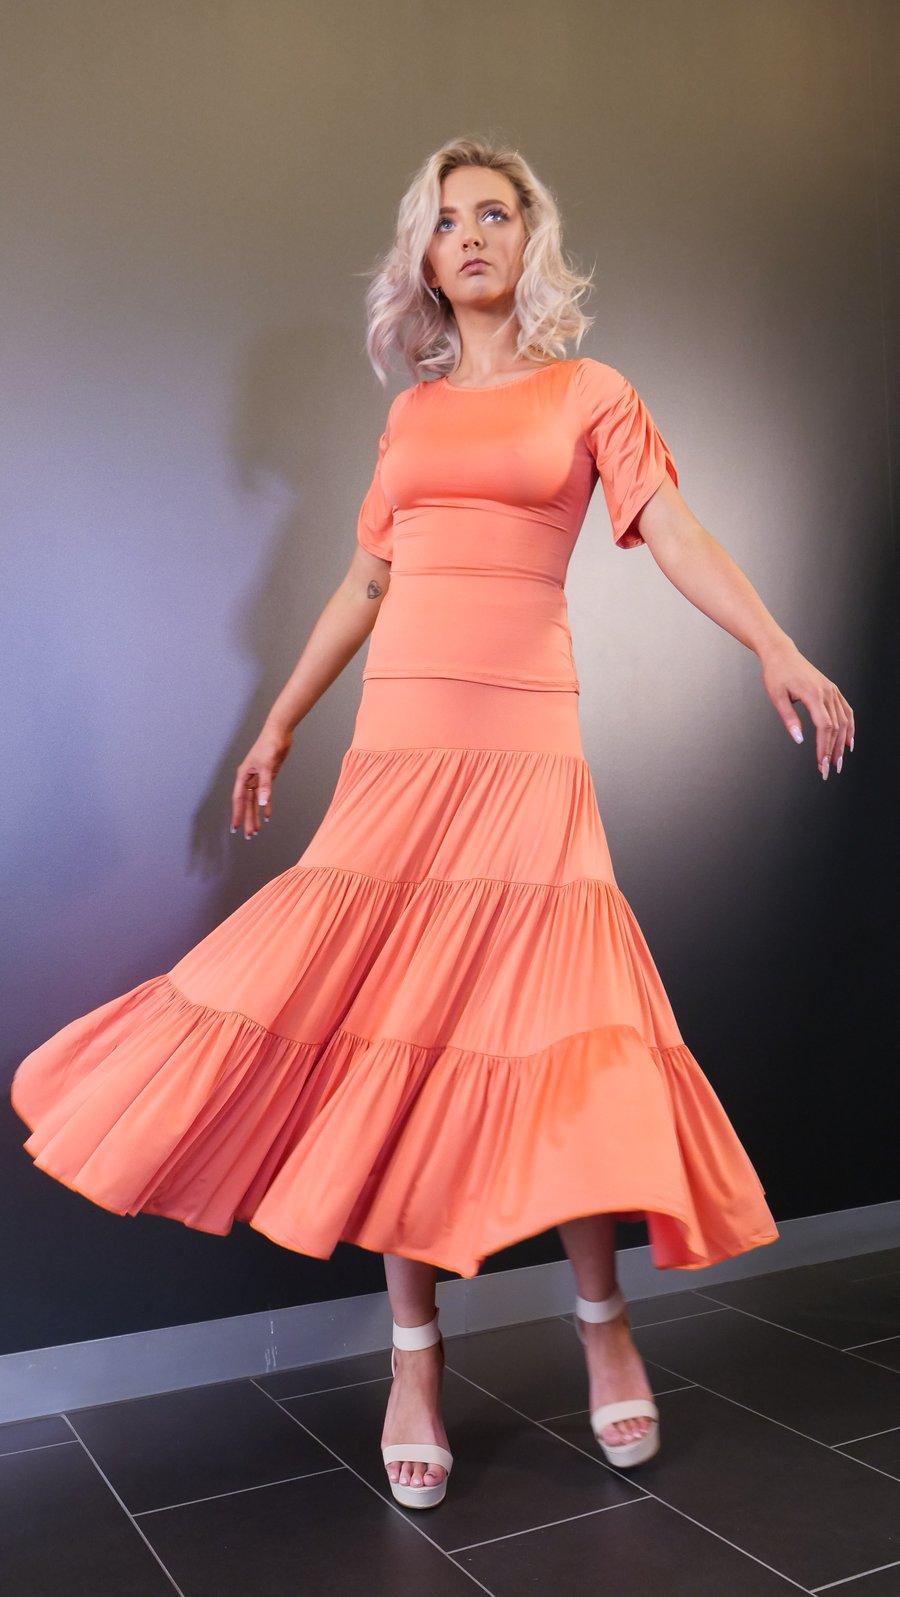 Image of Cloud Skirt - Orange J3302 Dancewear latin ballroom